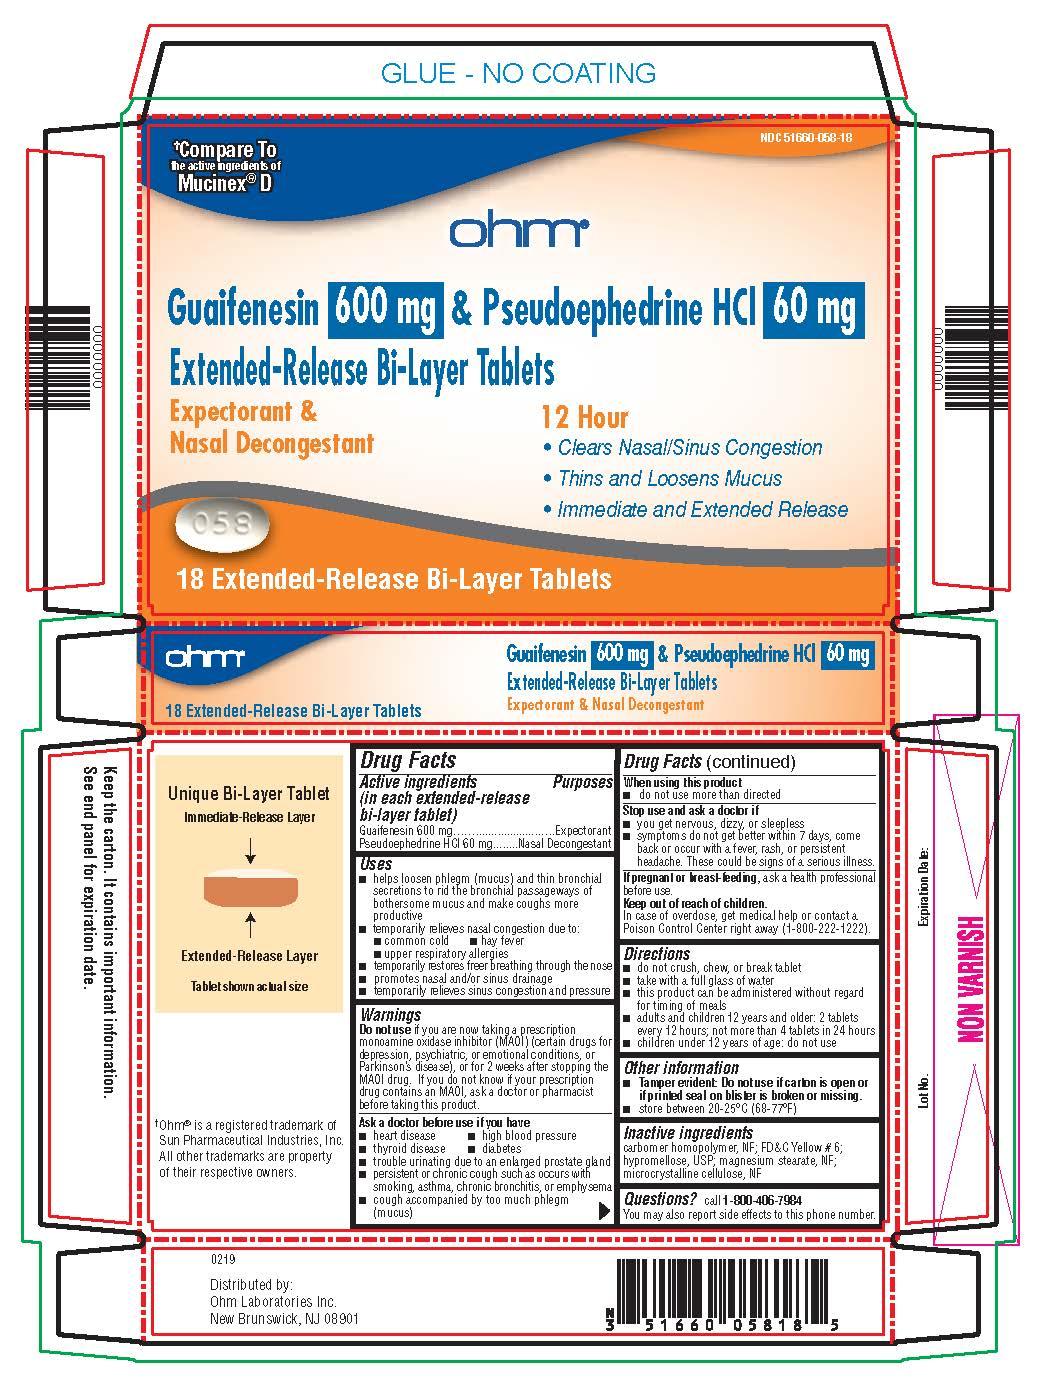 600 mg/60 mg Carton Label